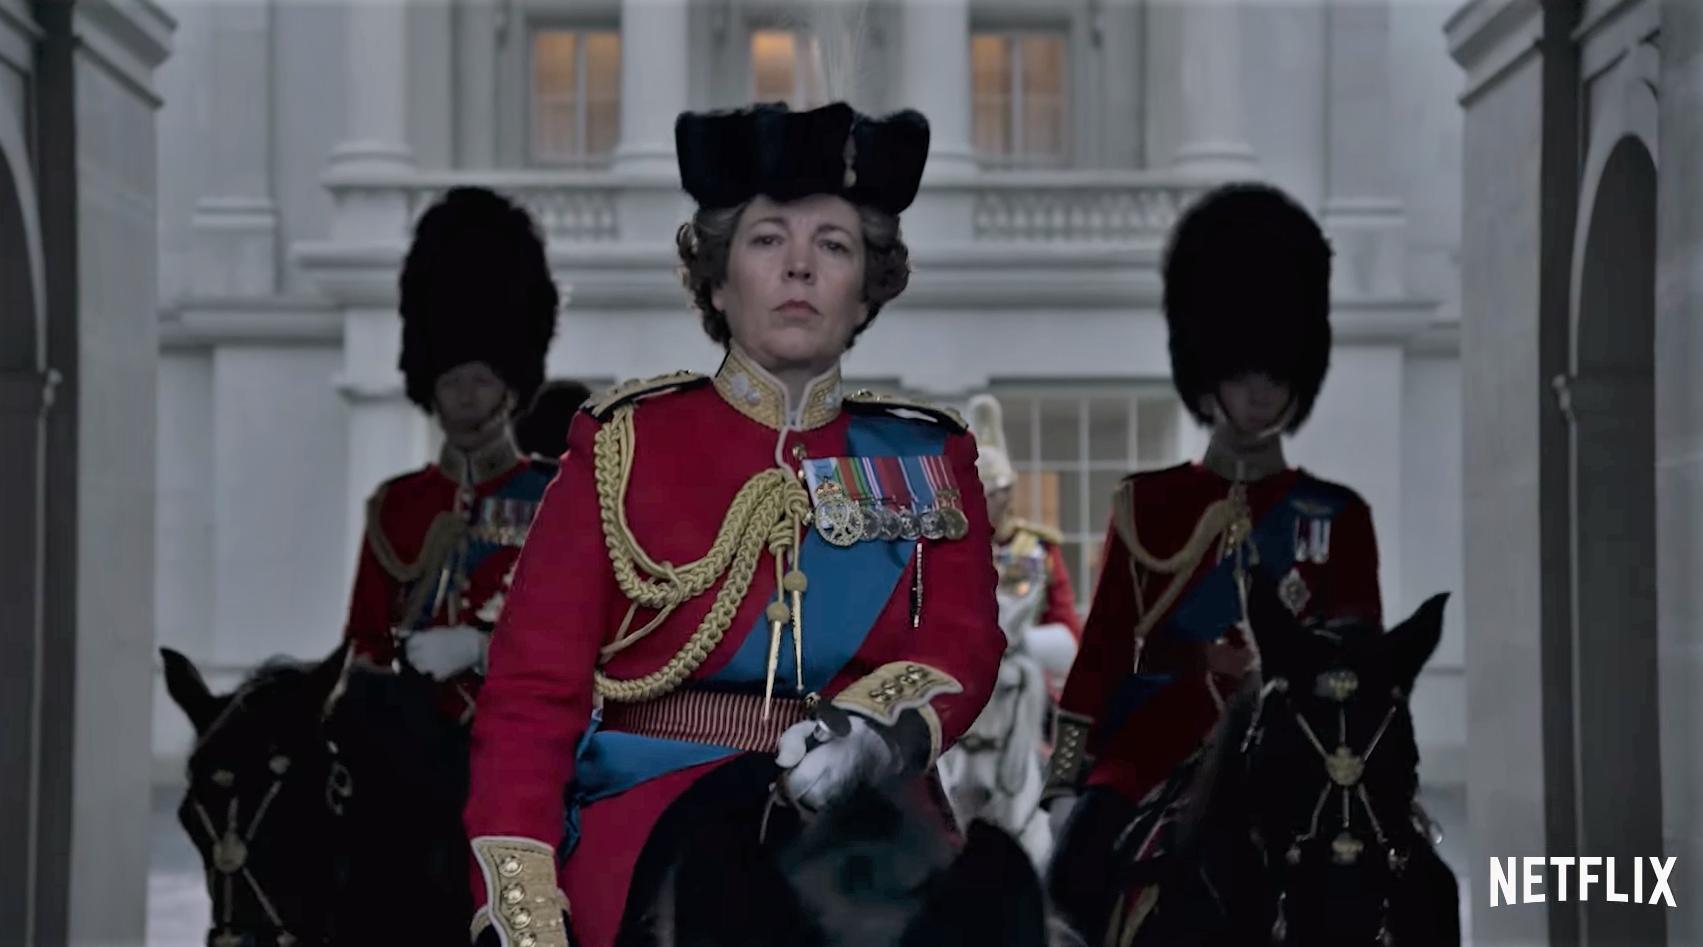 Netflix 影集《王冠》第四季釋出首支前導預告!姬蓮安德森加入扮演柴契爾夫人